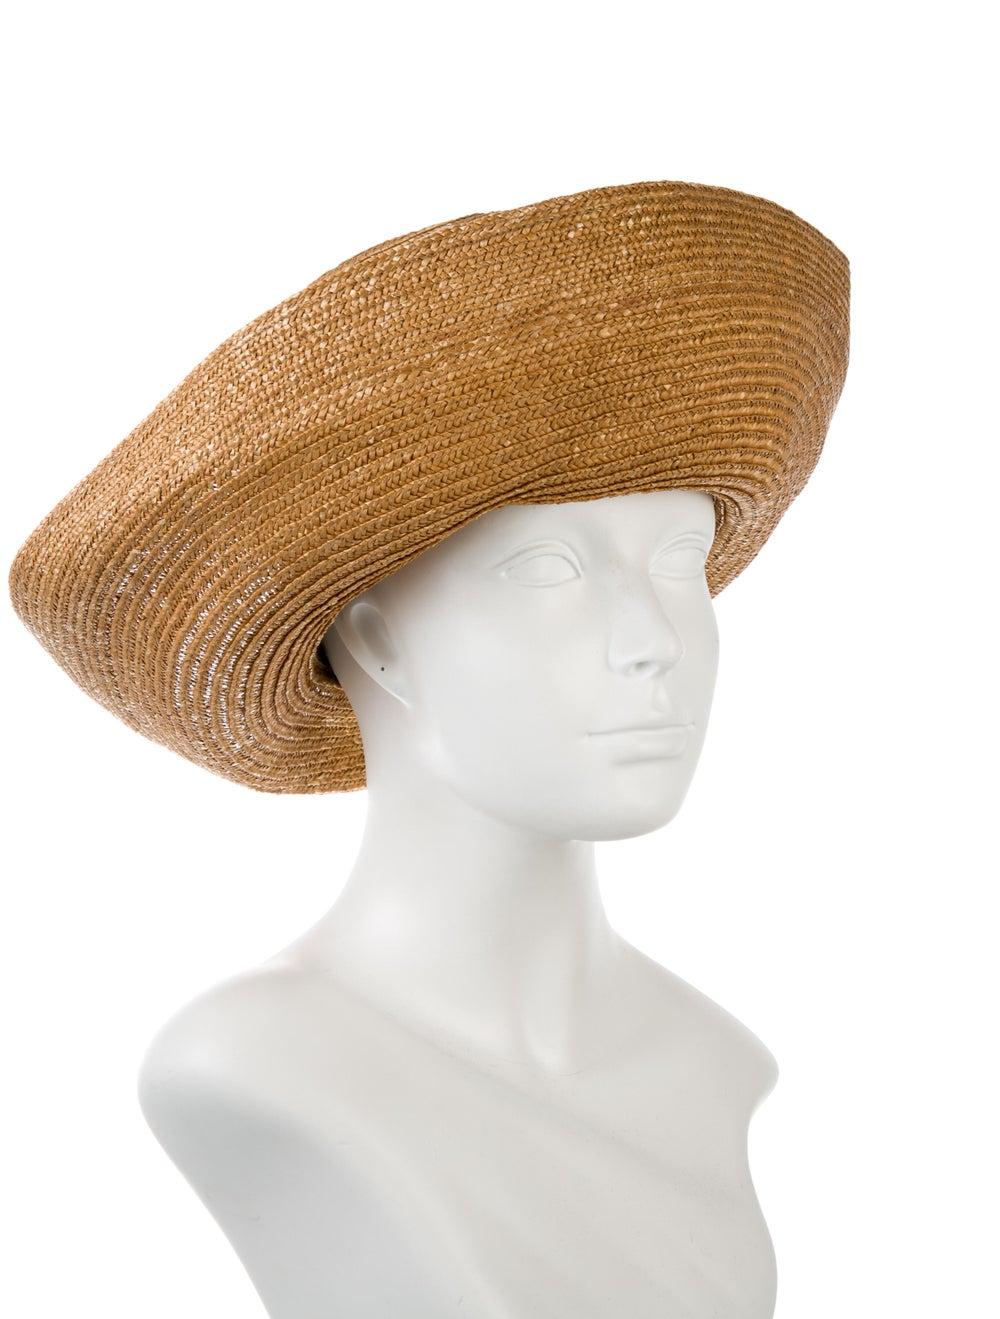 Eric Javits Straw Sun Hat Tan - image 3